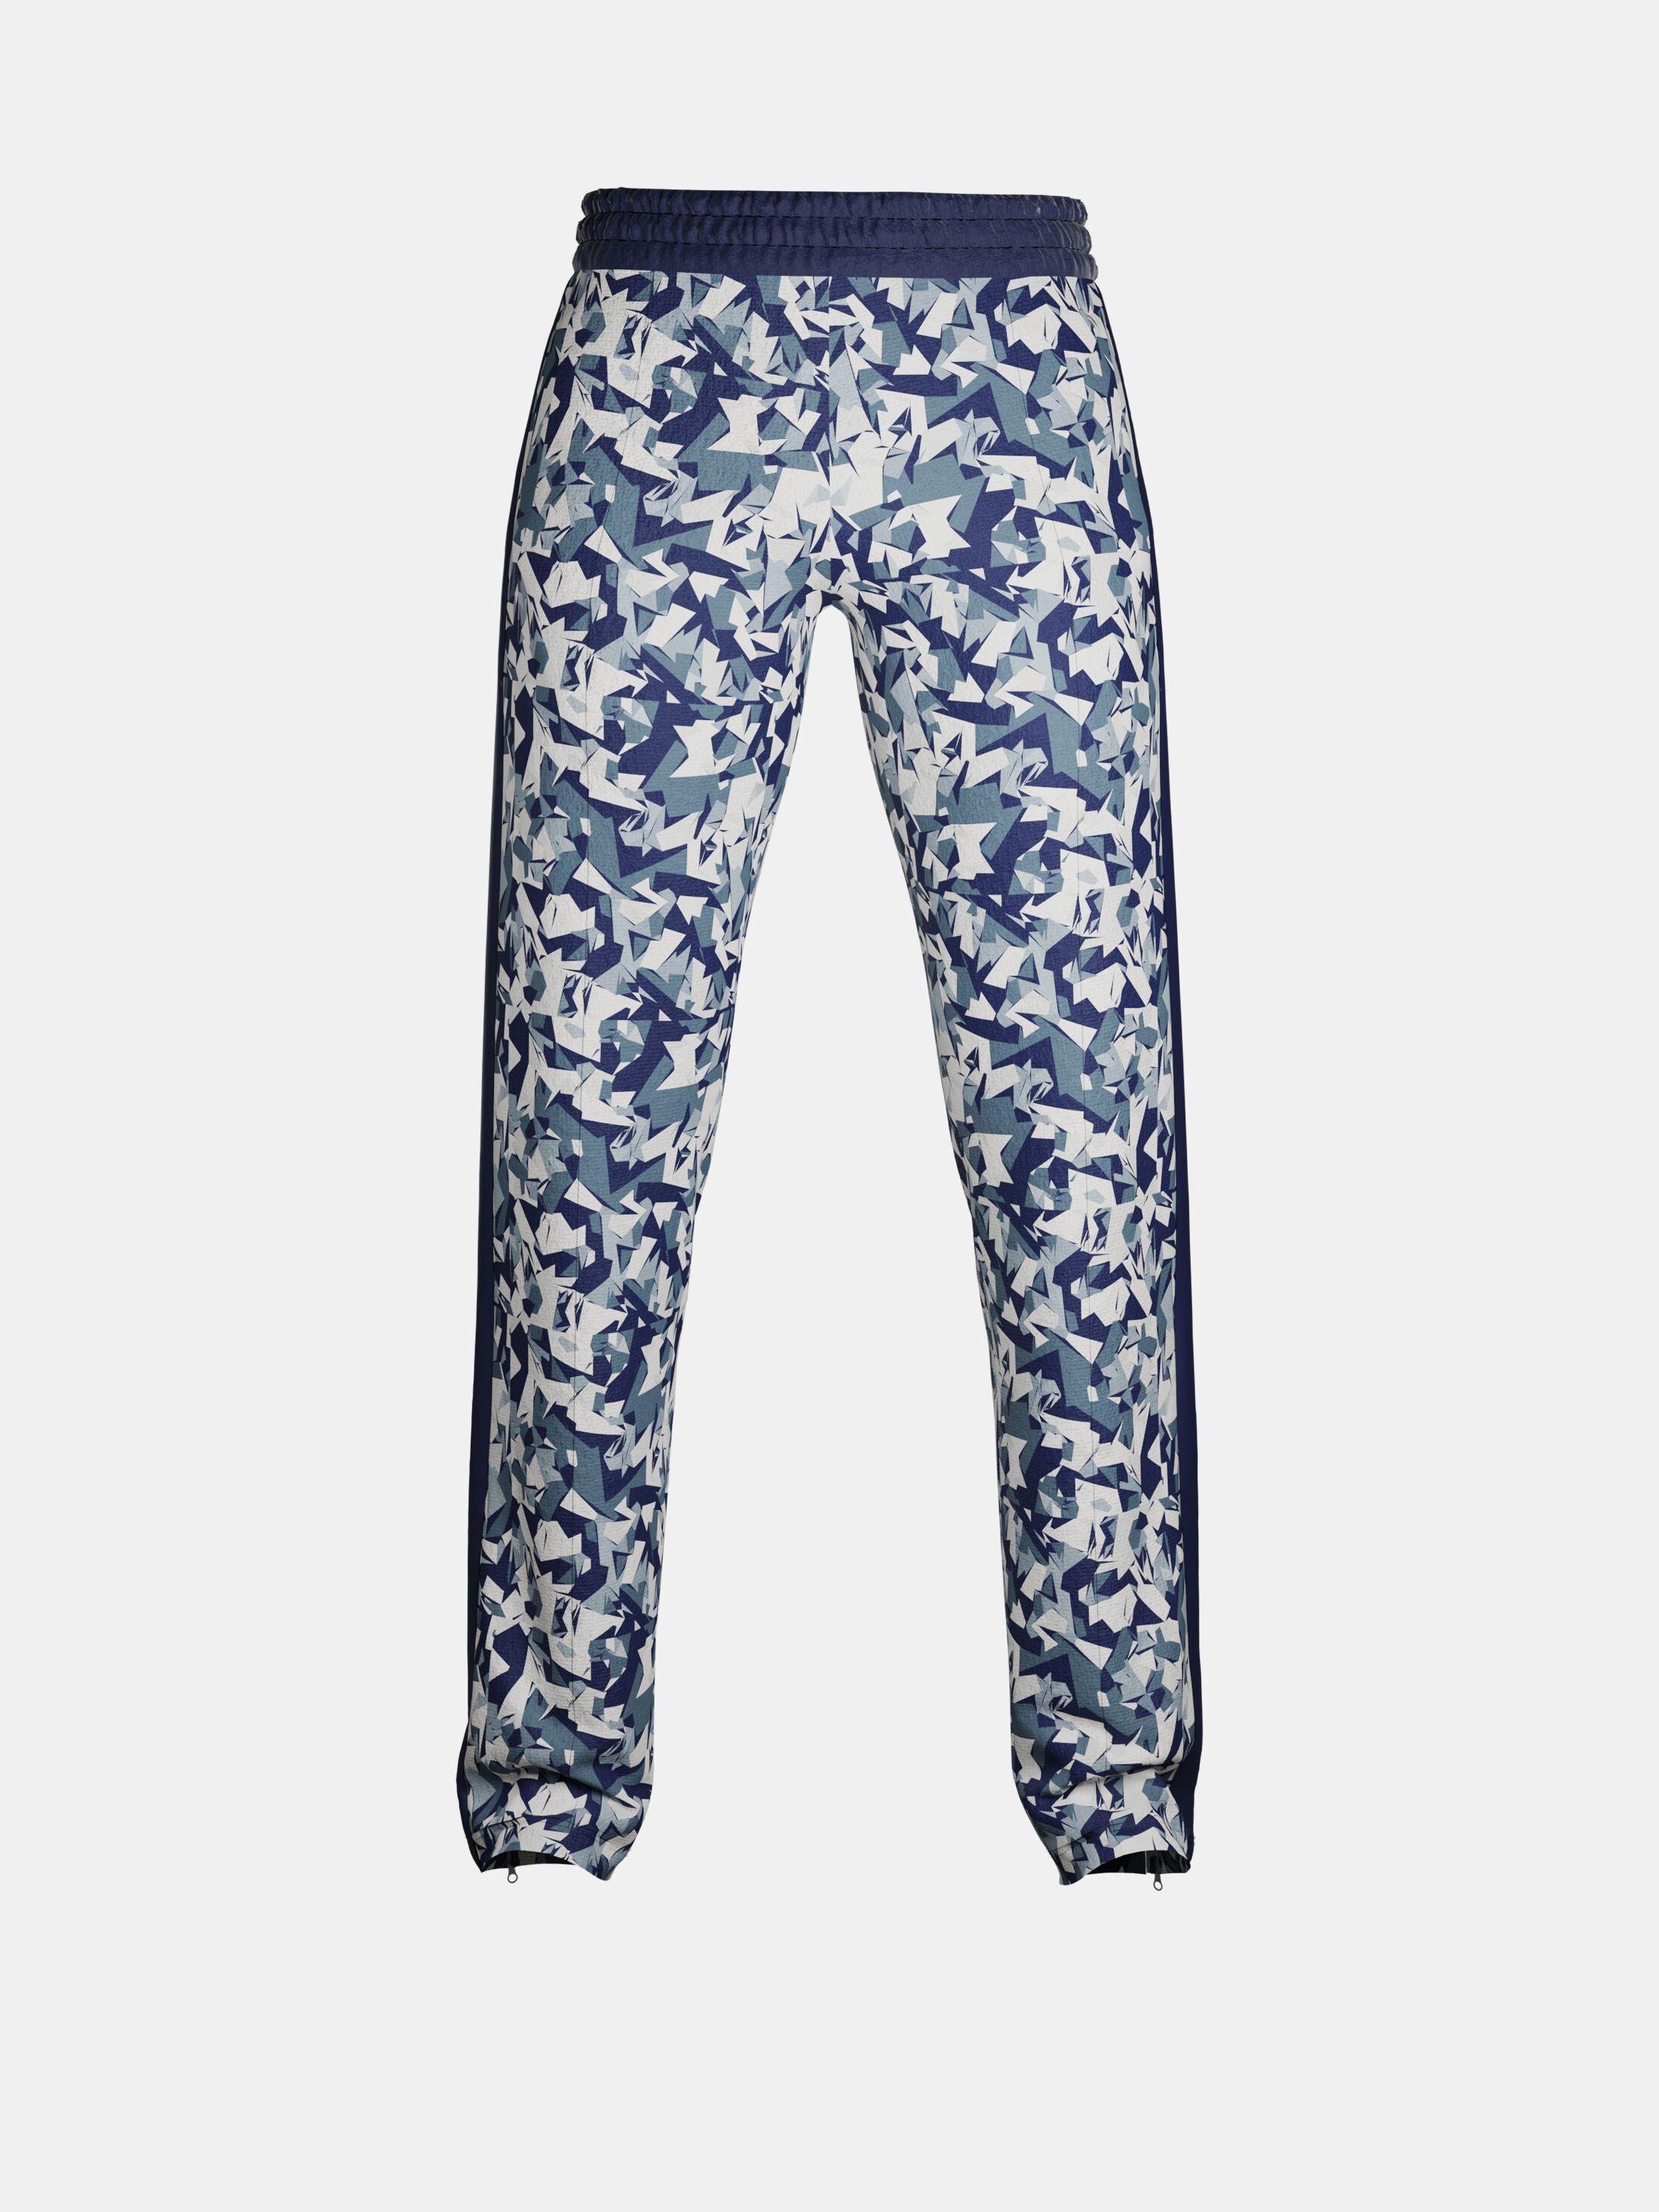 Custom Jogging Jacket & Pants handmade